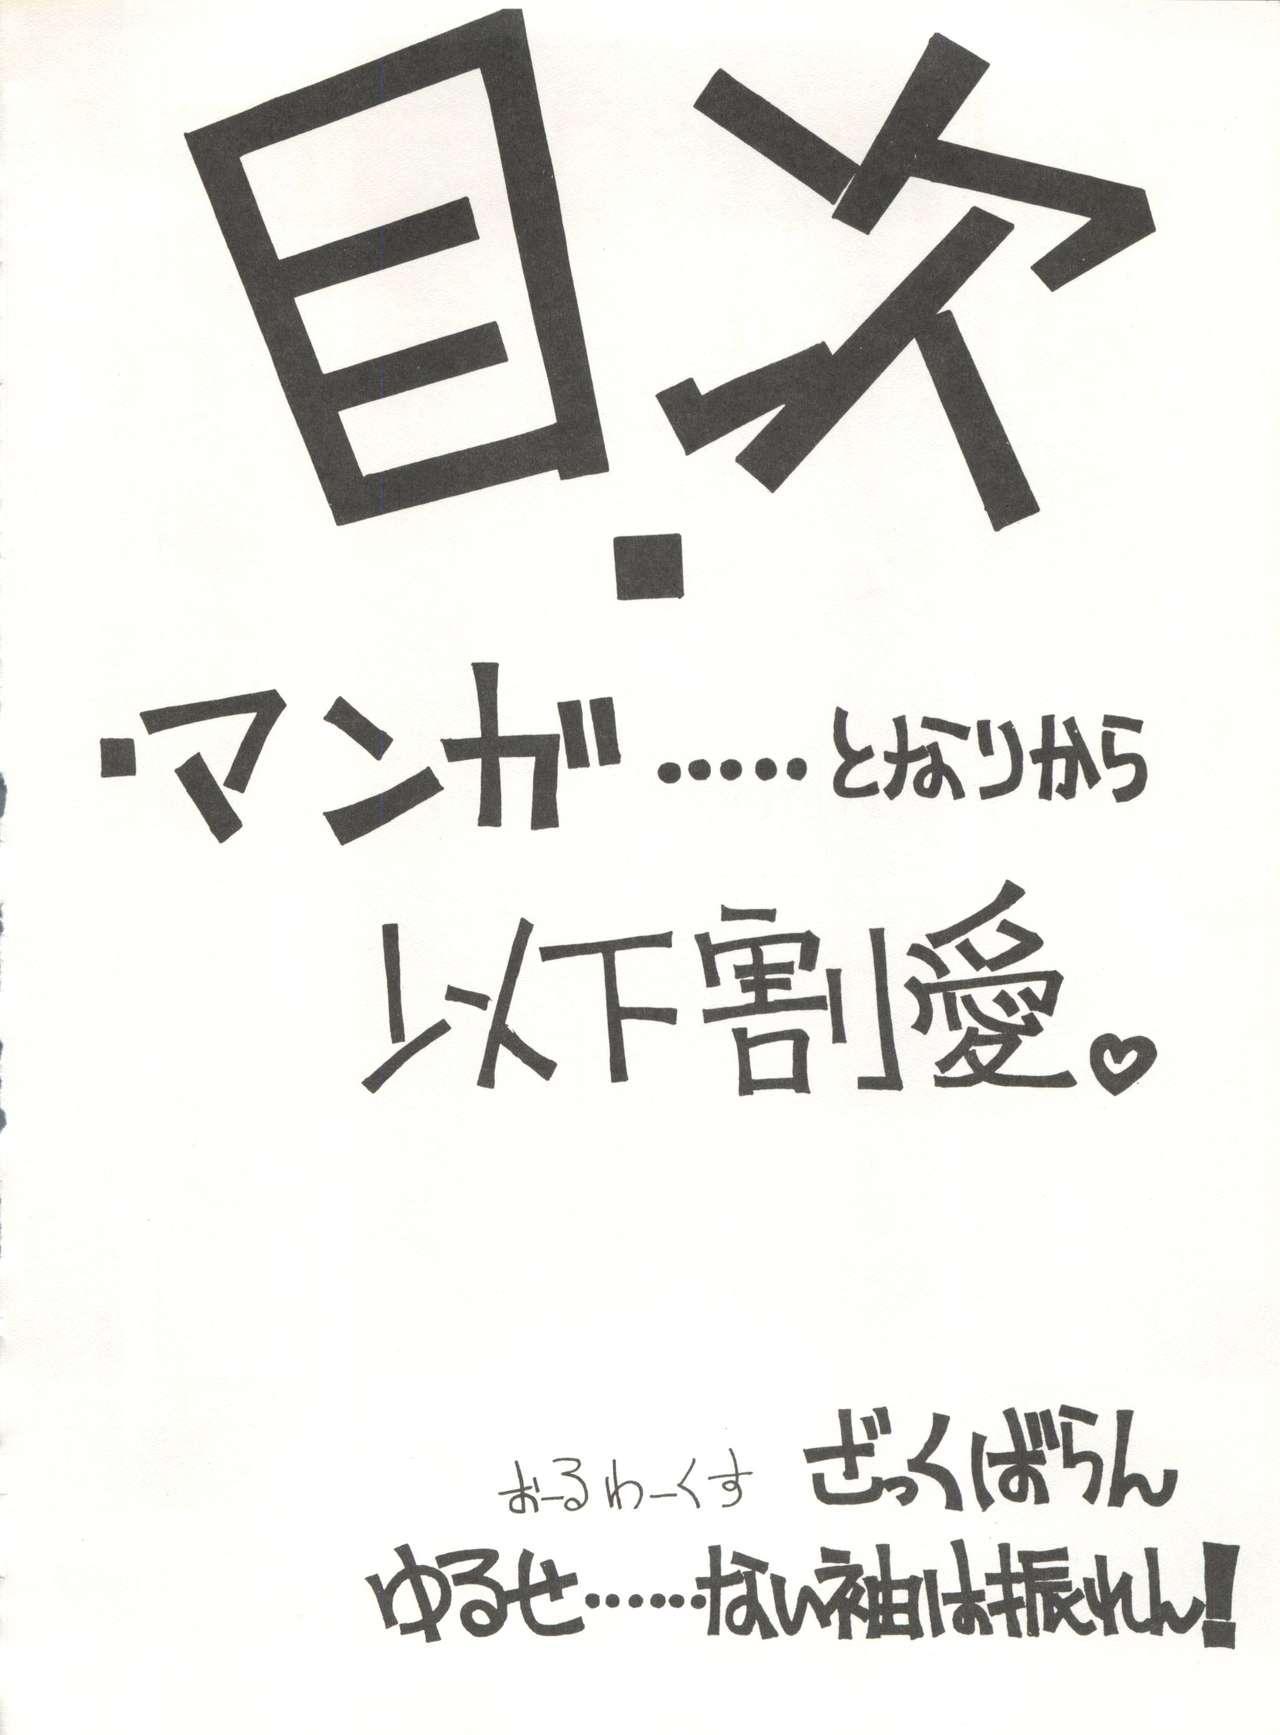 [Global One (MARO)] Sadistic 5 (Cutey Honey, Devilman, Sailor Moon), [Global One (MARO)] Sadistic (Dirty Pair, Fushigi no Umi no Nadia, Sailor Moon), [Studio Ikkatsumajin] .ribbon (Hime-chan's Ribbon) 127